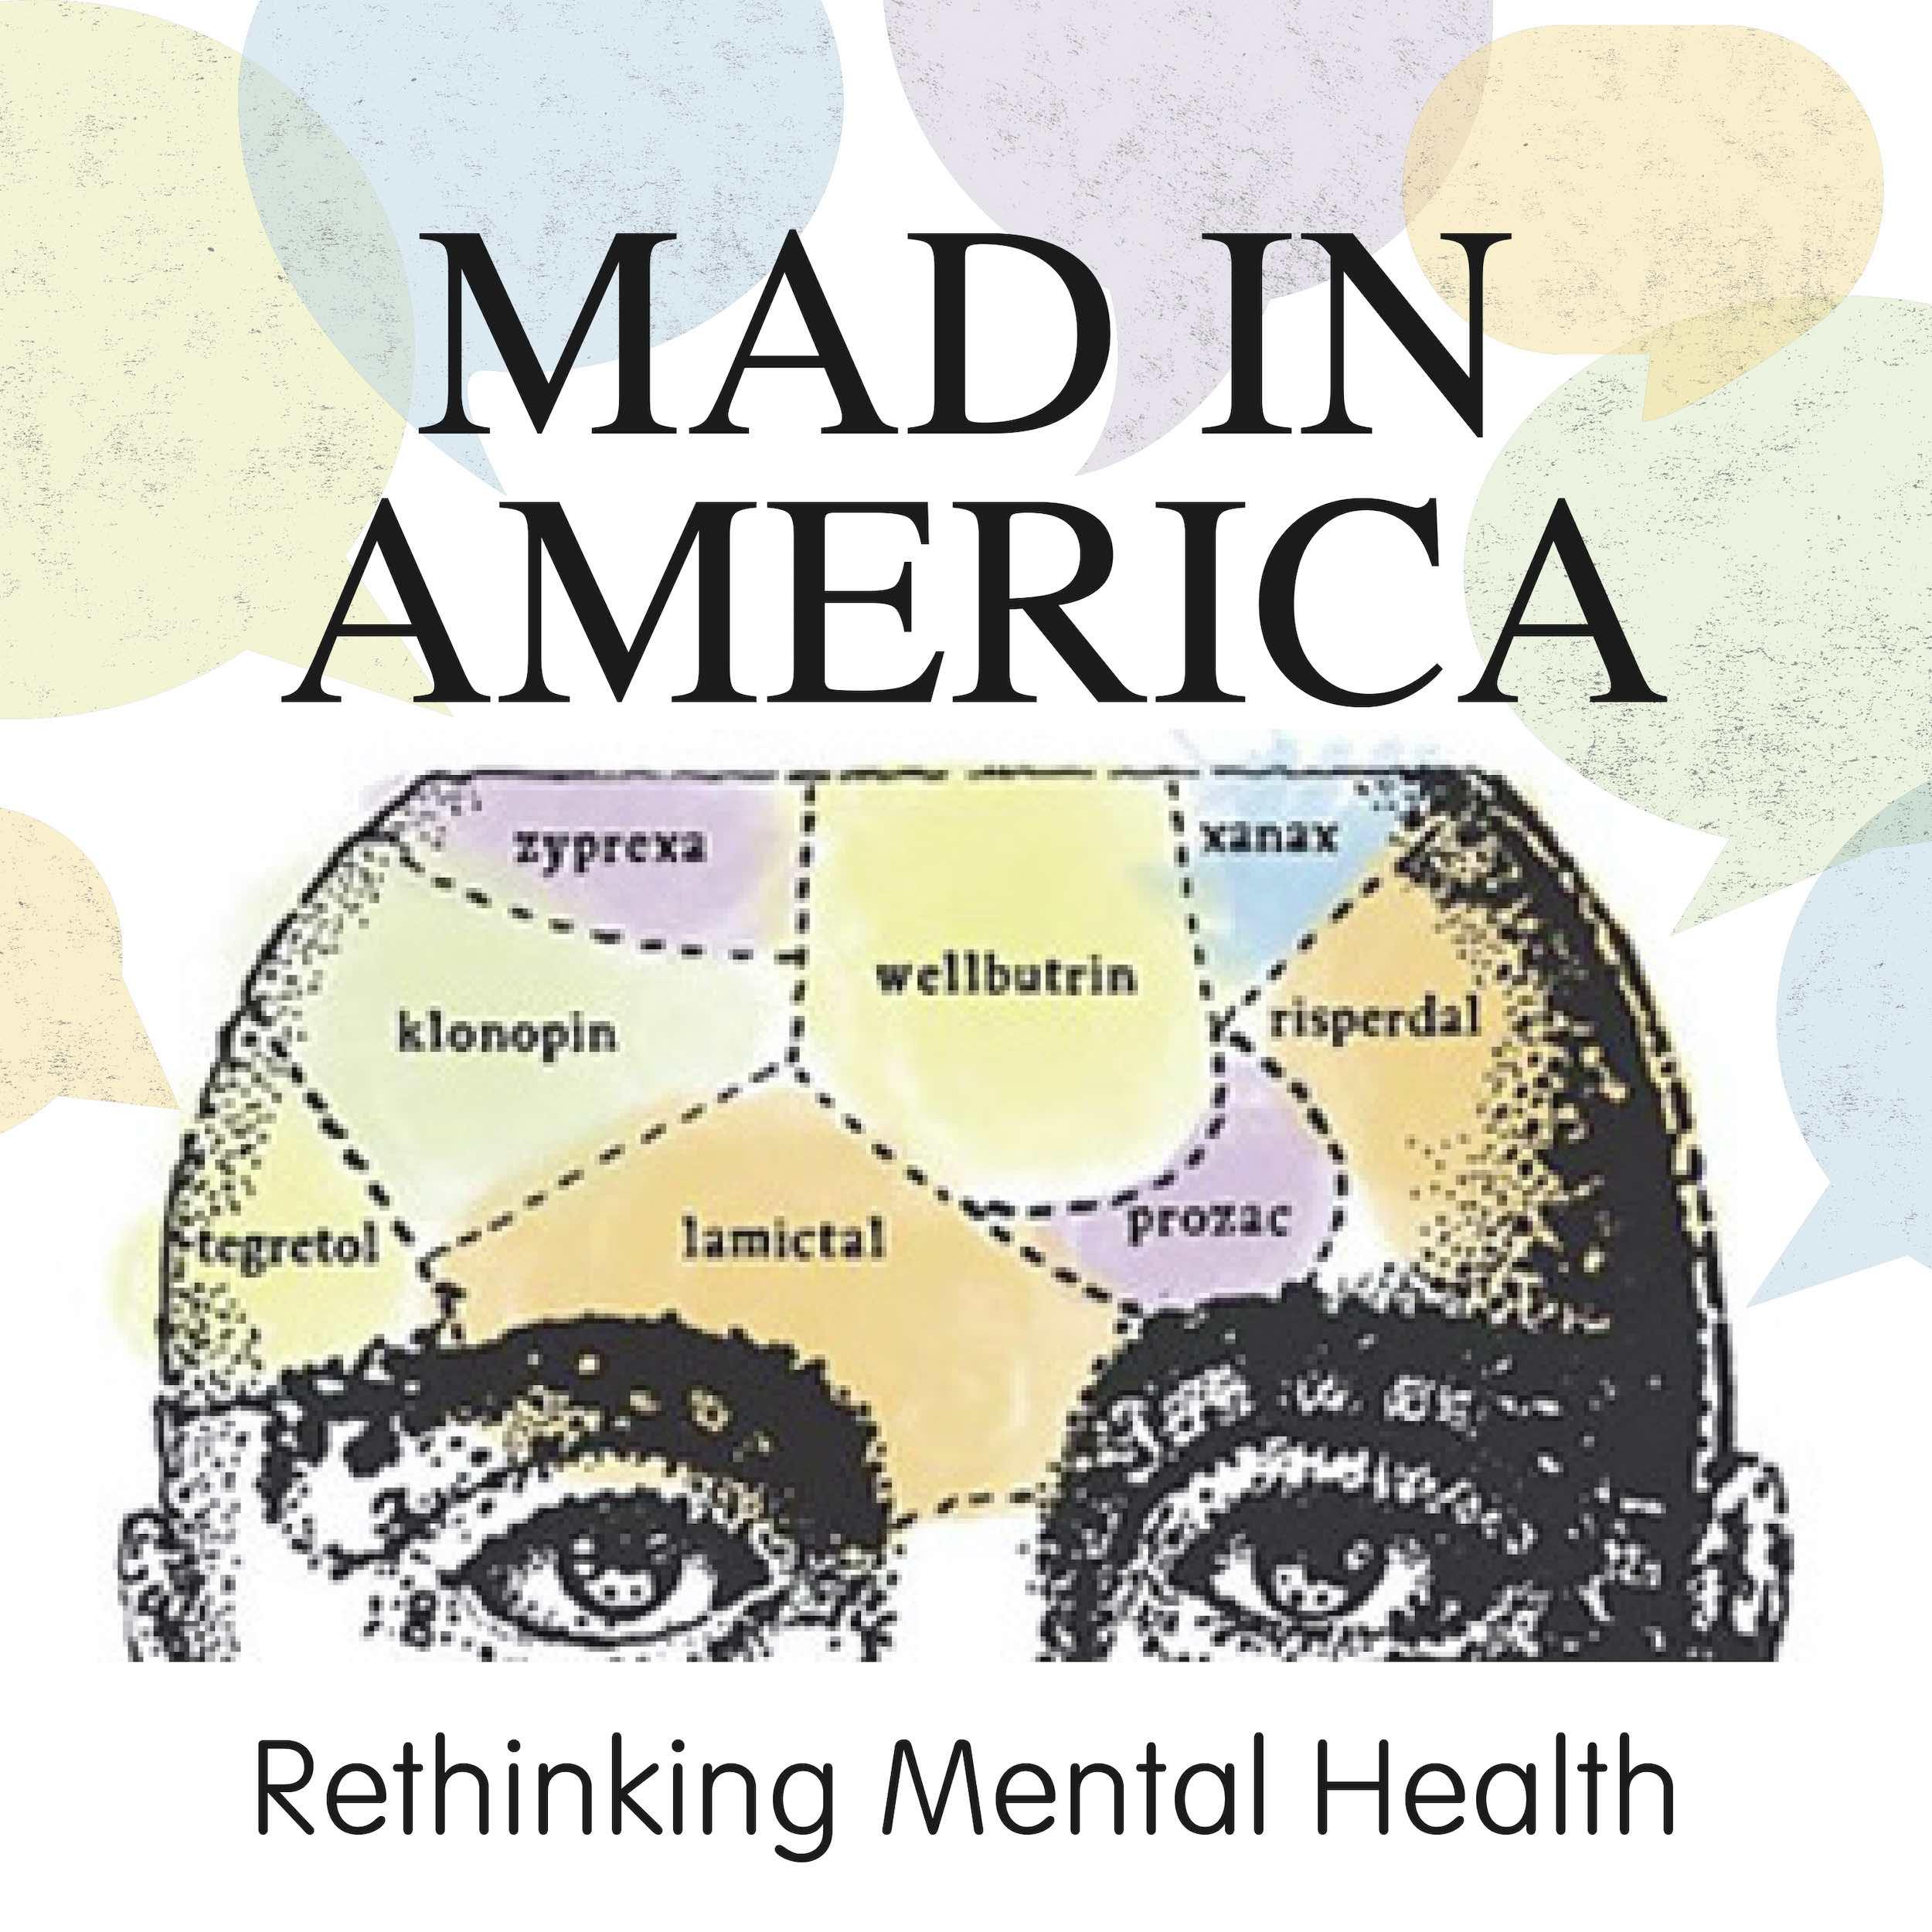 Mad in America: Rethinking Mental Health - John Read - UK Esketamine Approval - Not so Fast